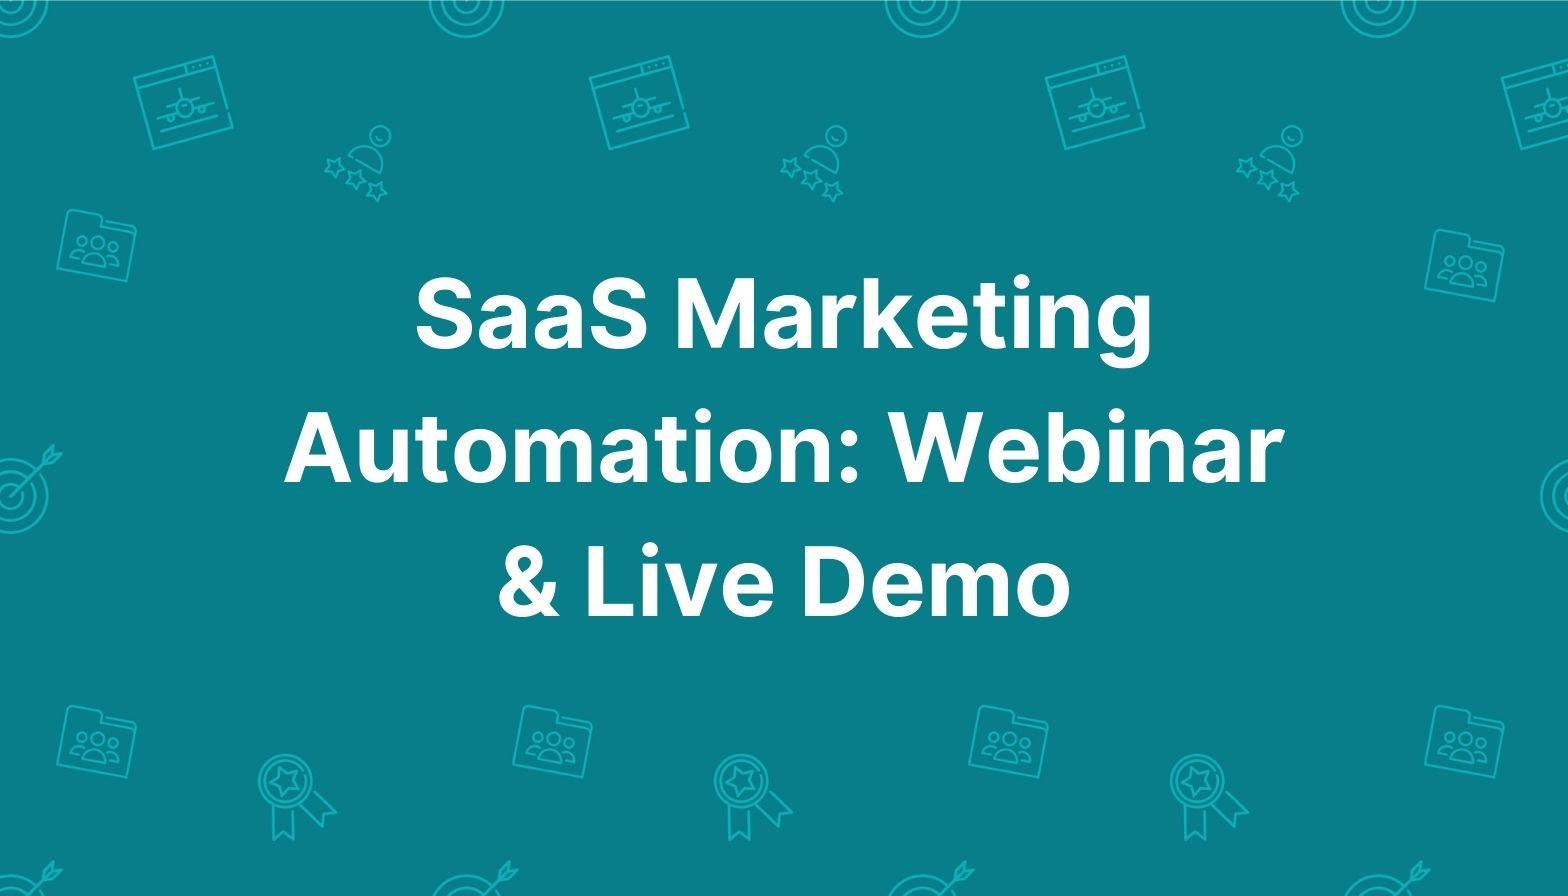 Feature image: SaaS marketing automation: webinar & live demo